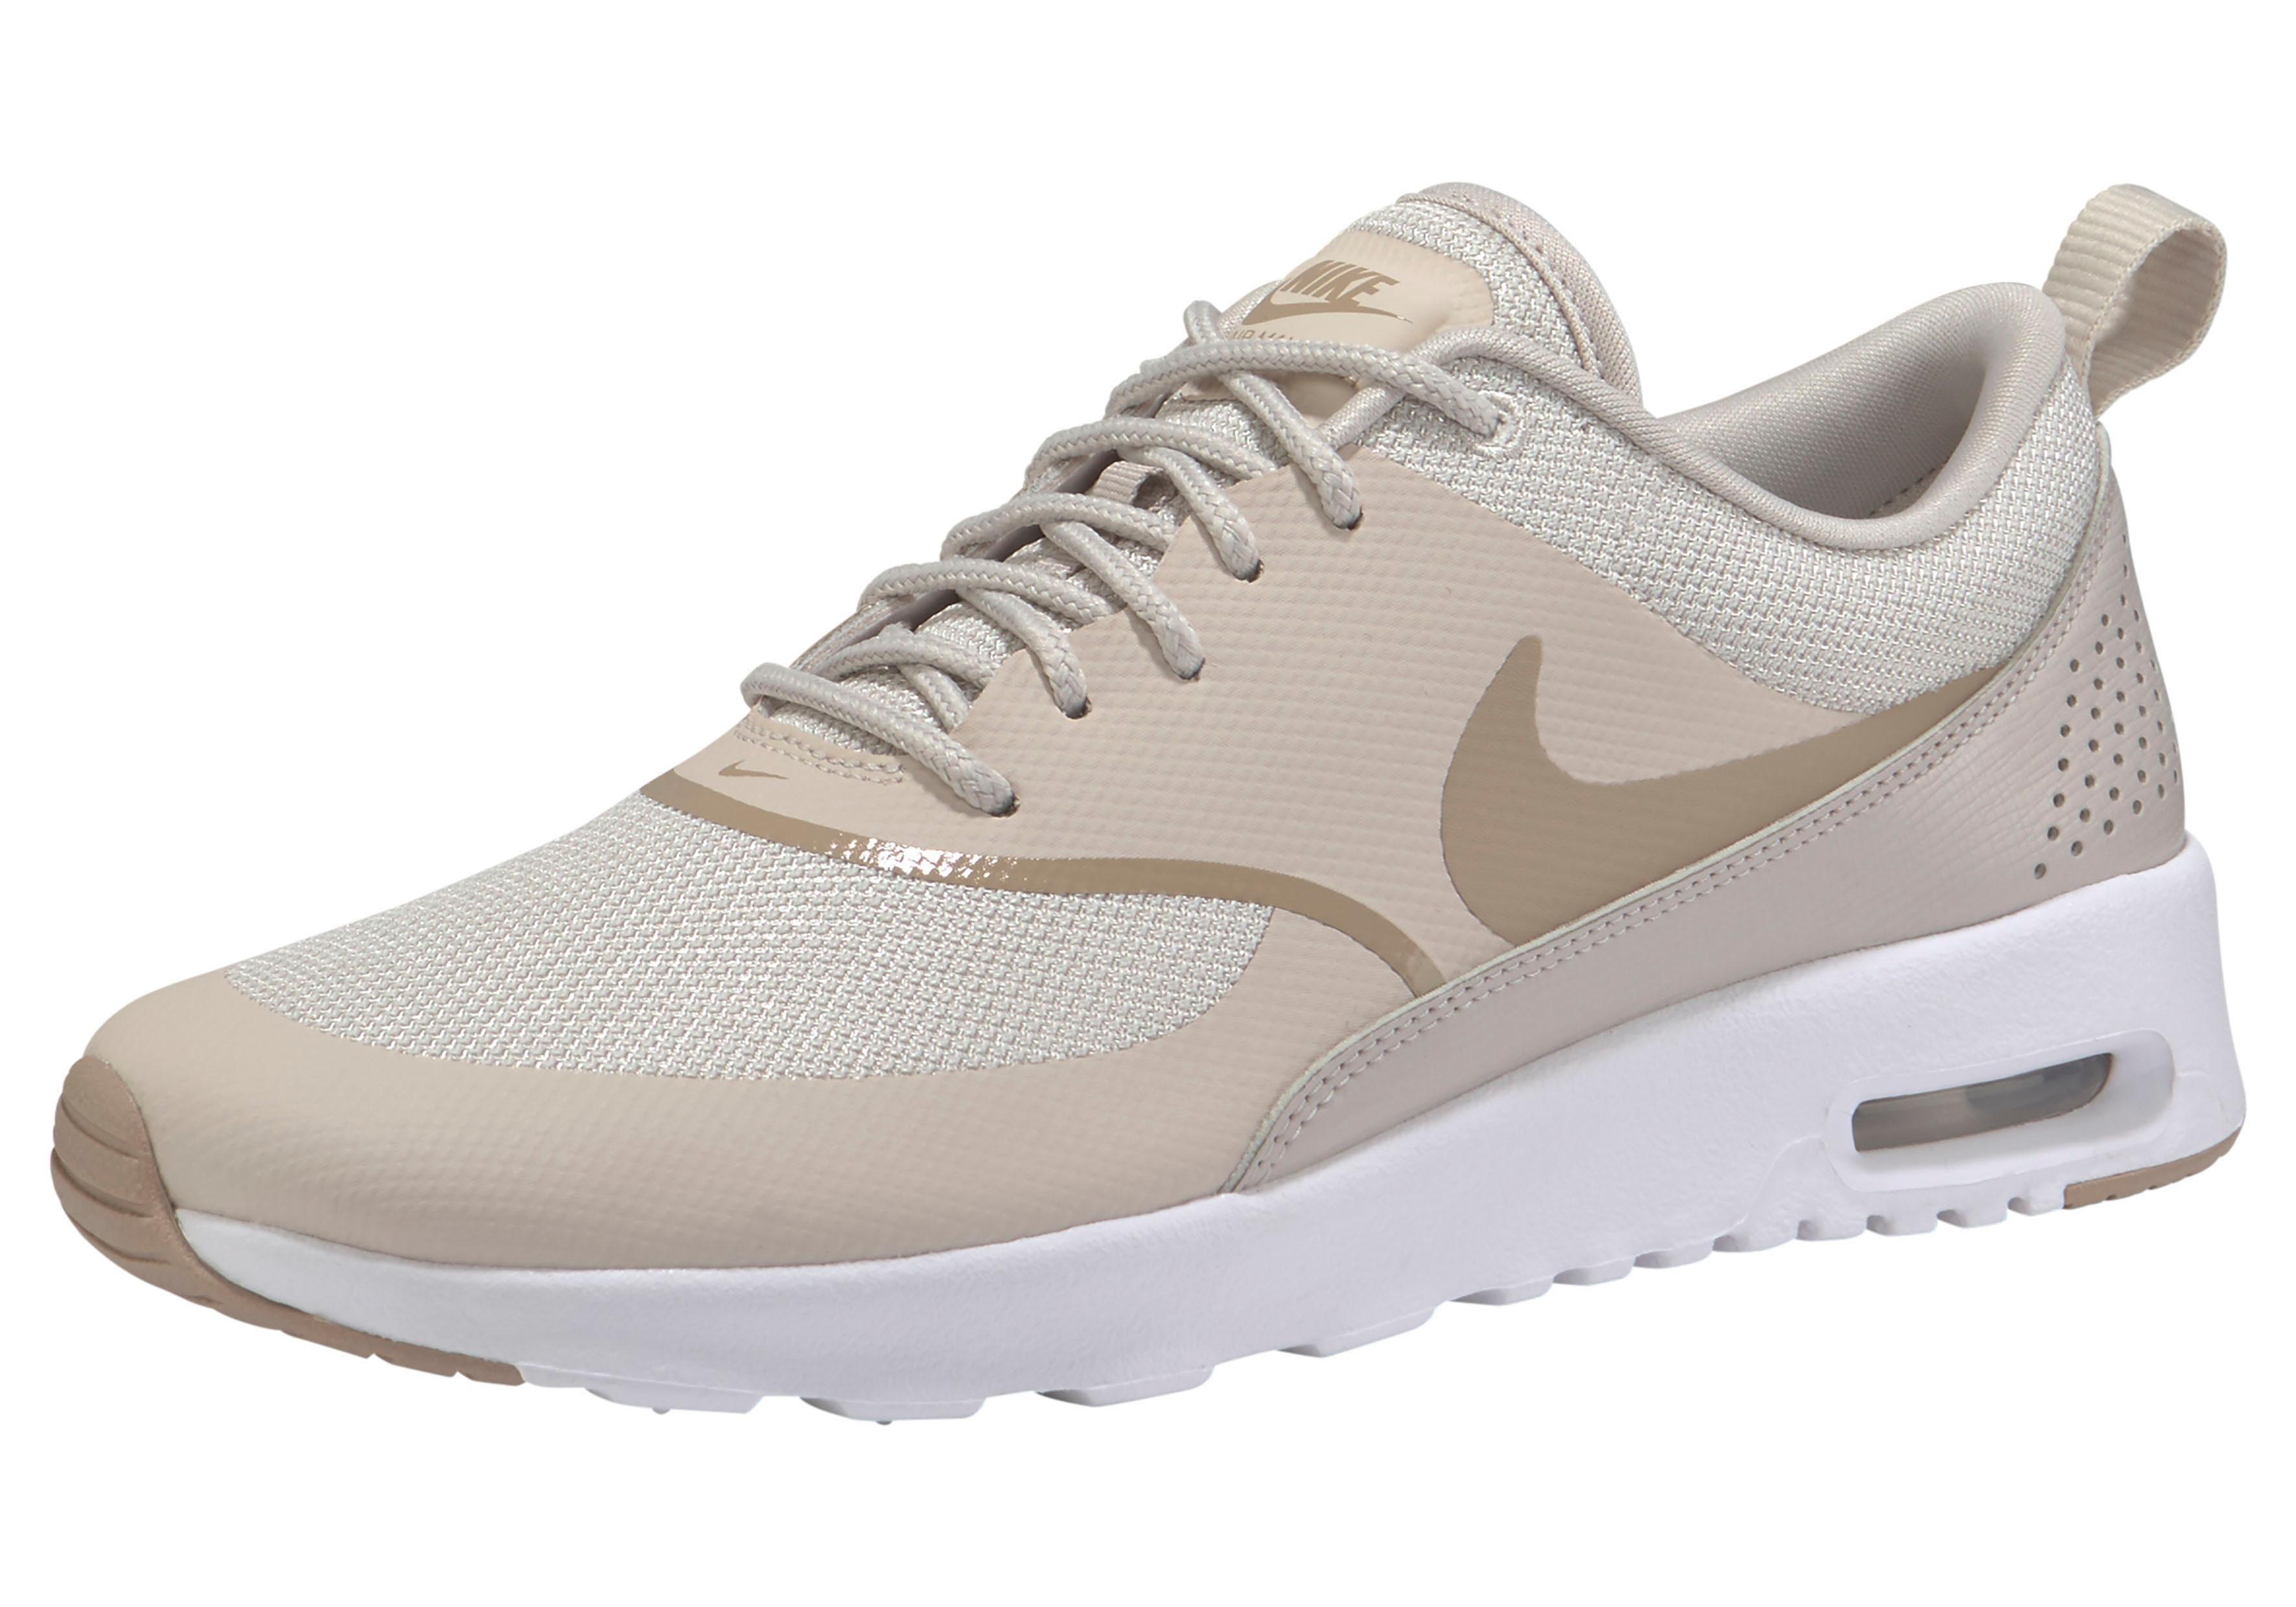 Nike Sportswear »Air Max Thea« Sneaker, Schmal geschnittene Passform online kaufen | OTTO